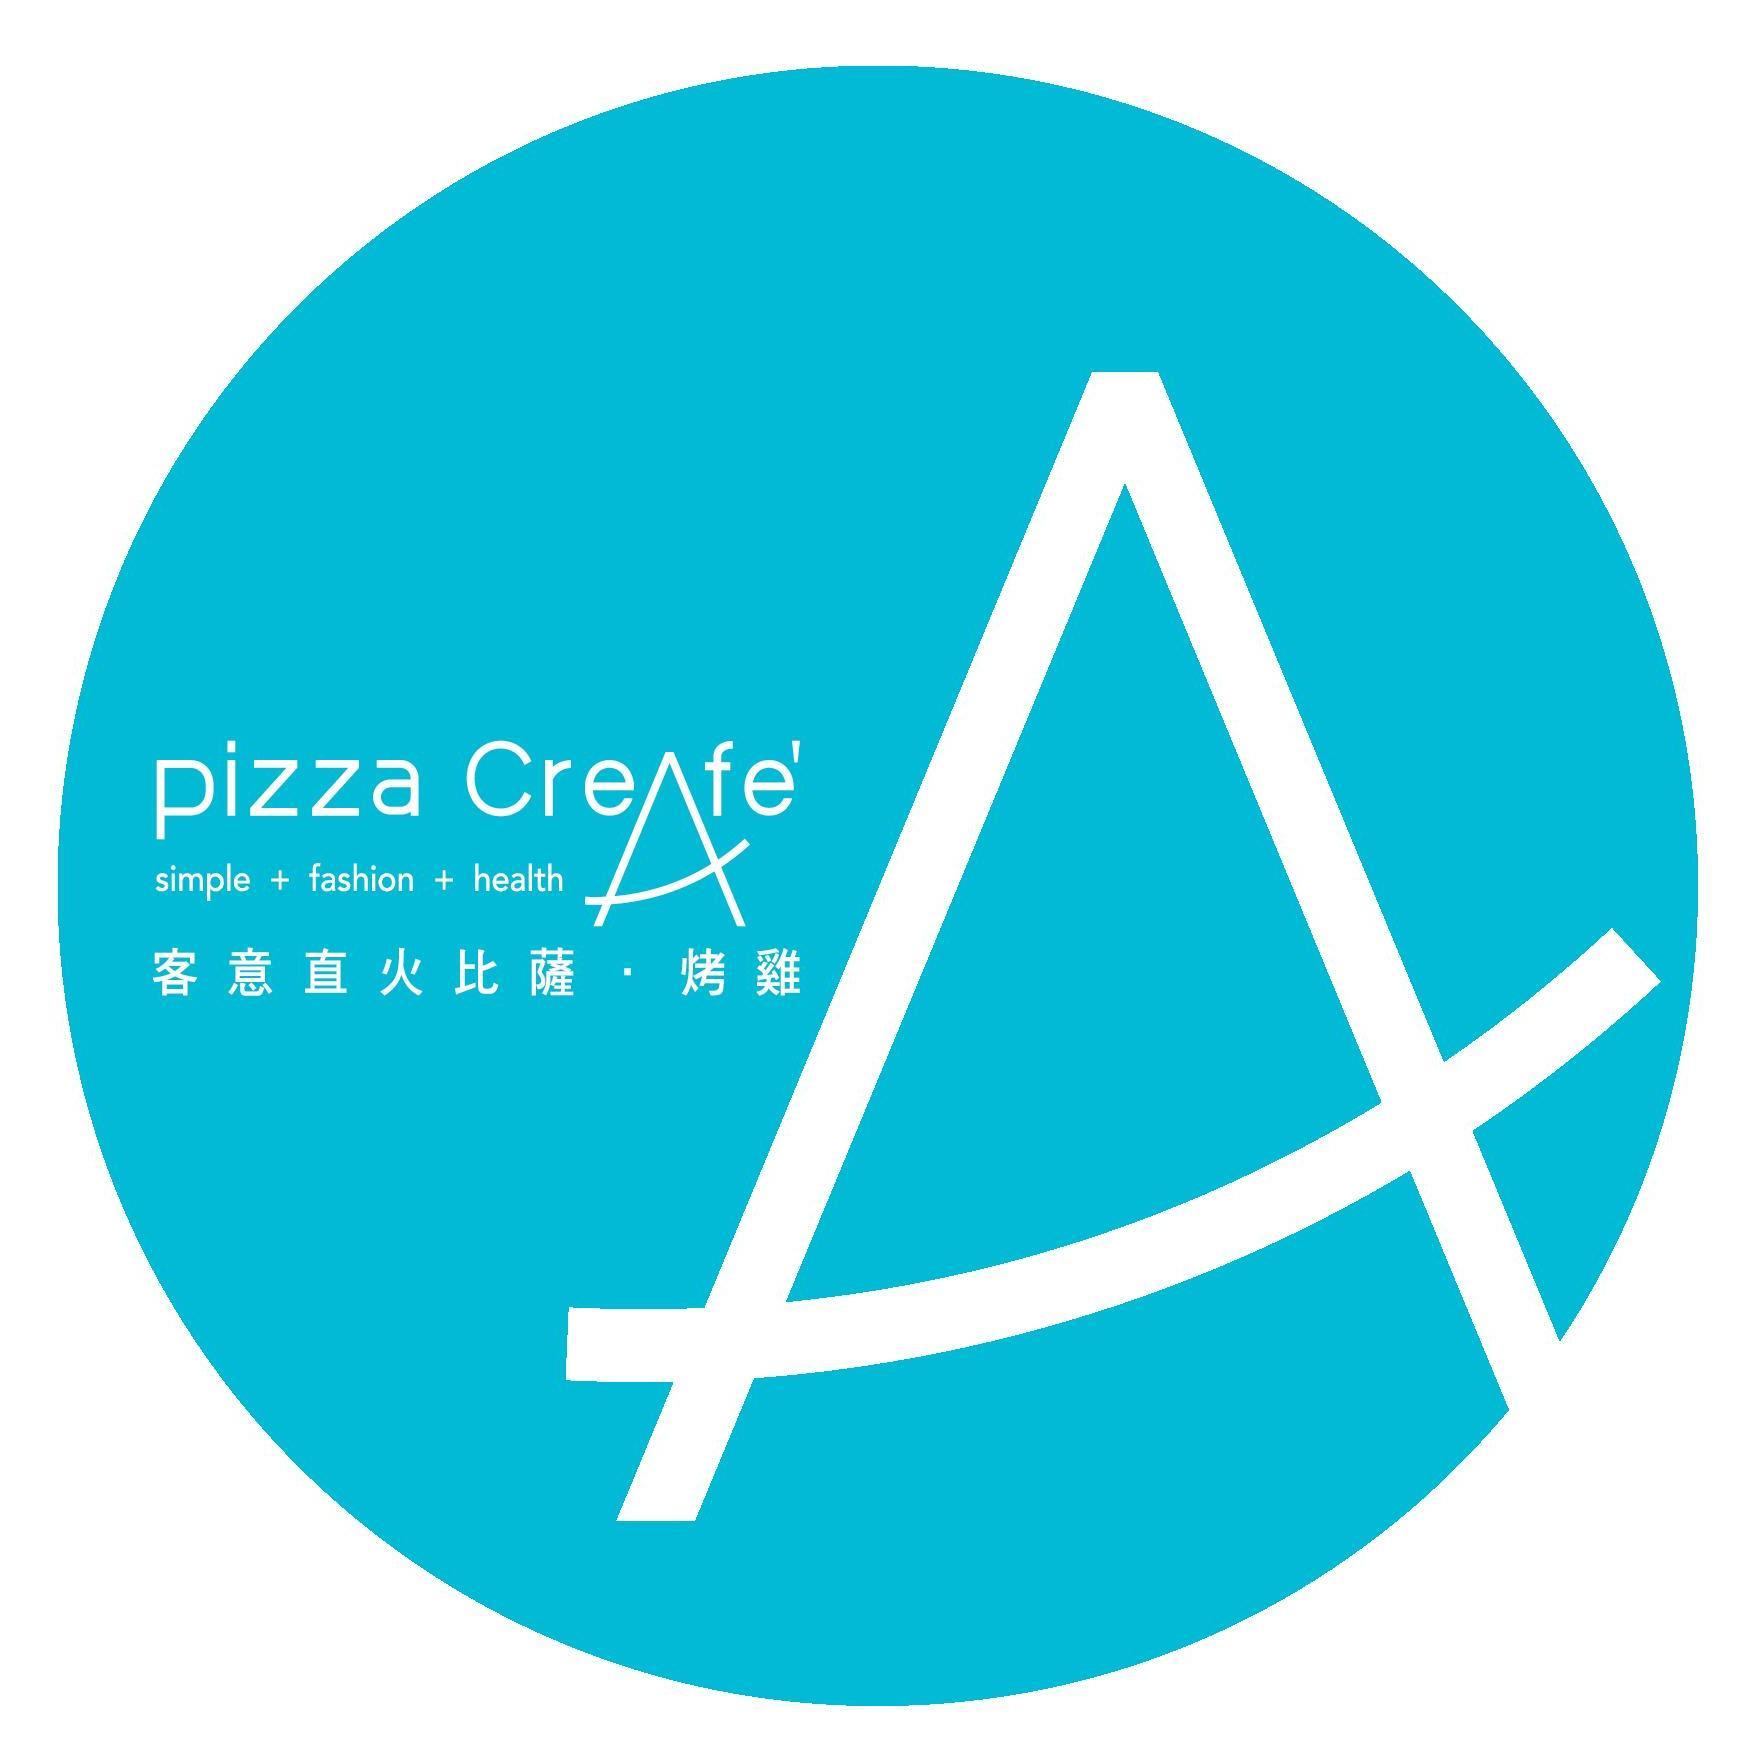 Pizza CreAfe' 客意直火比薩 ‧ 烤雞